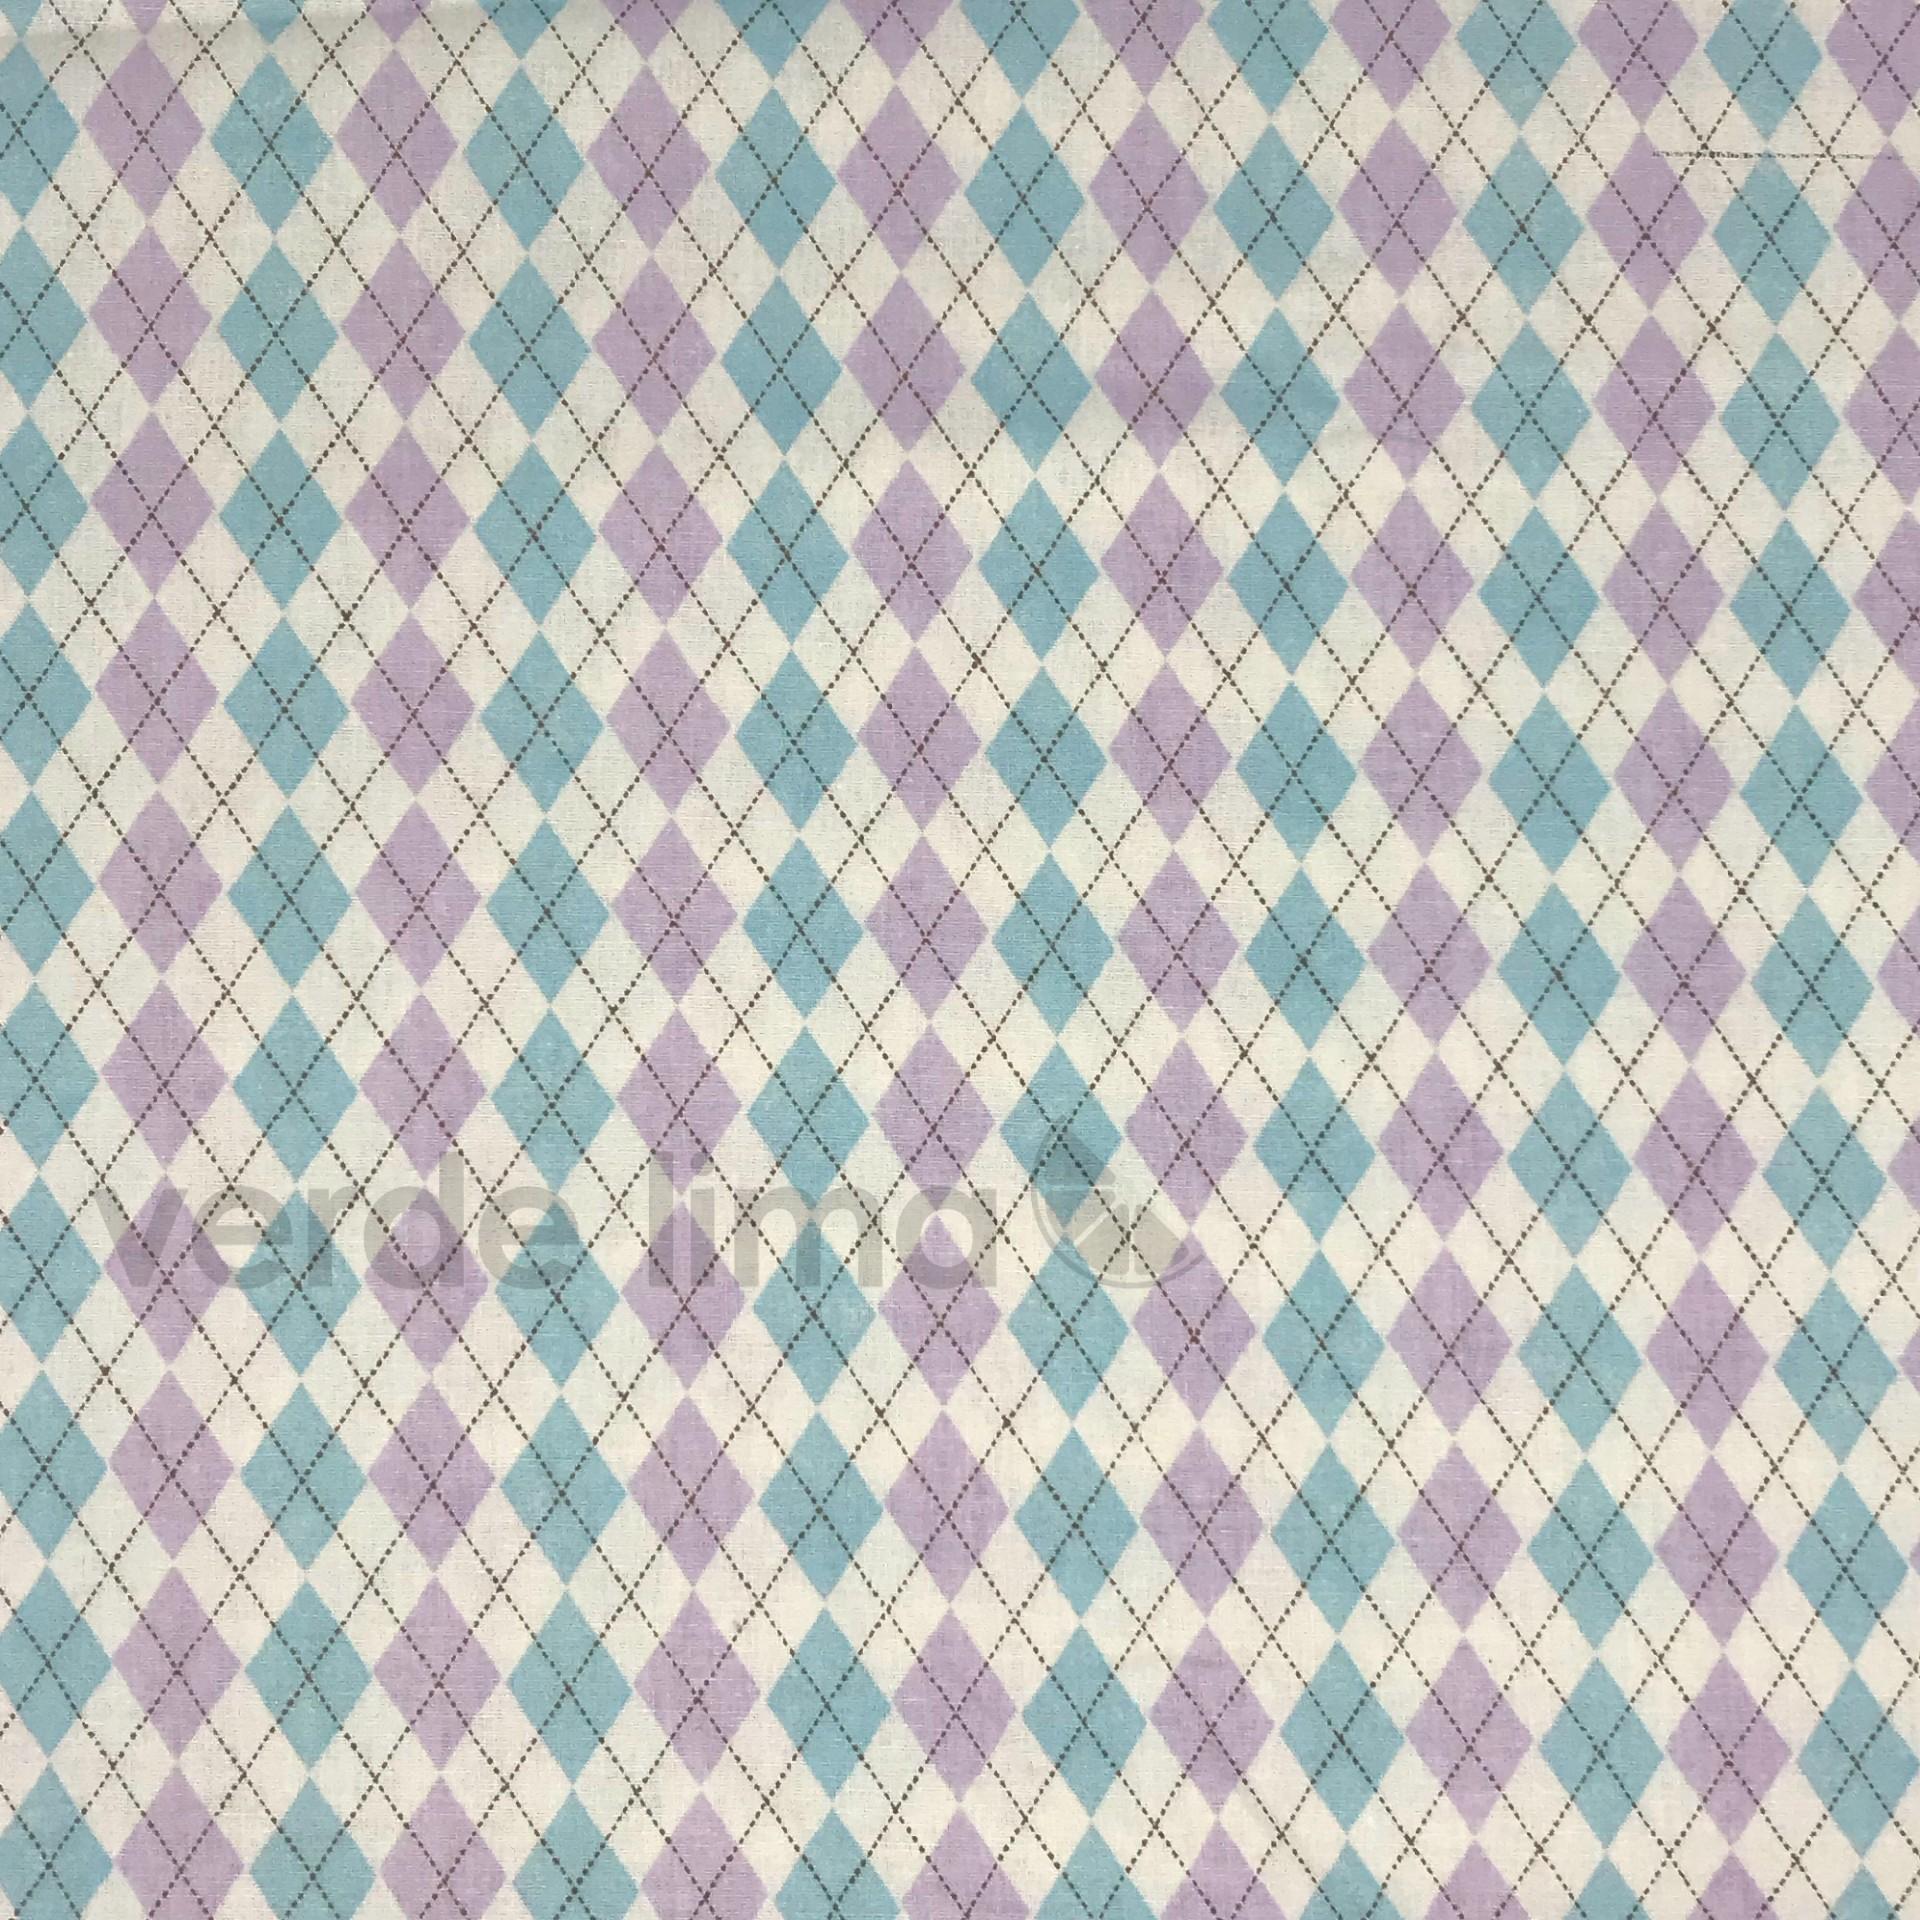 Balões Anita Catita - xadrez em lilás